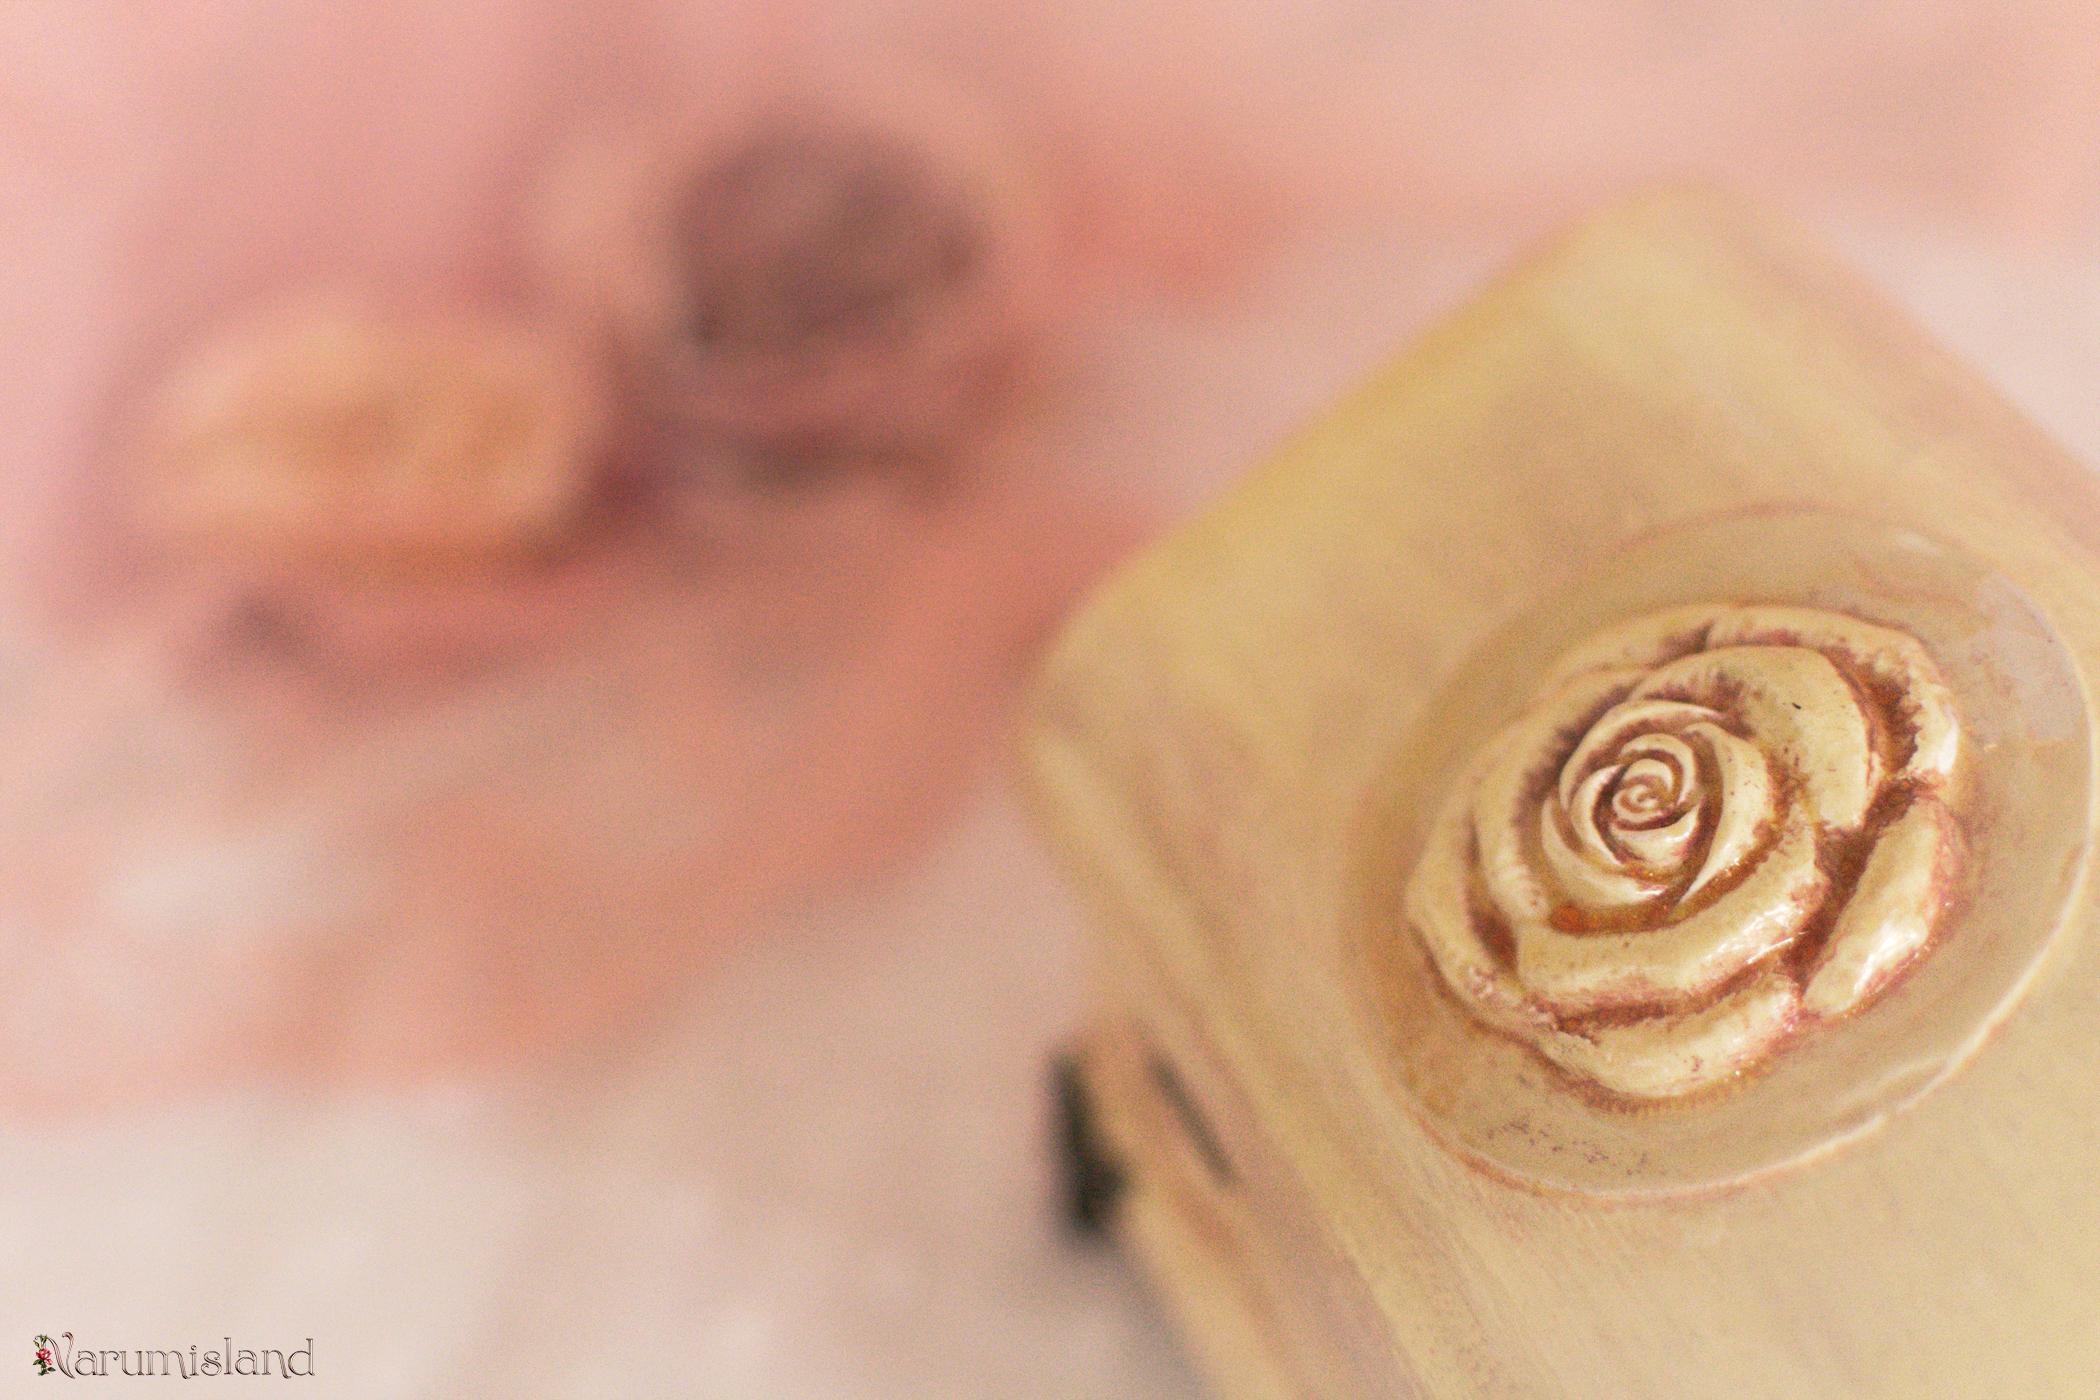 Detaliu Cufar Cu Ornament 3d Roz